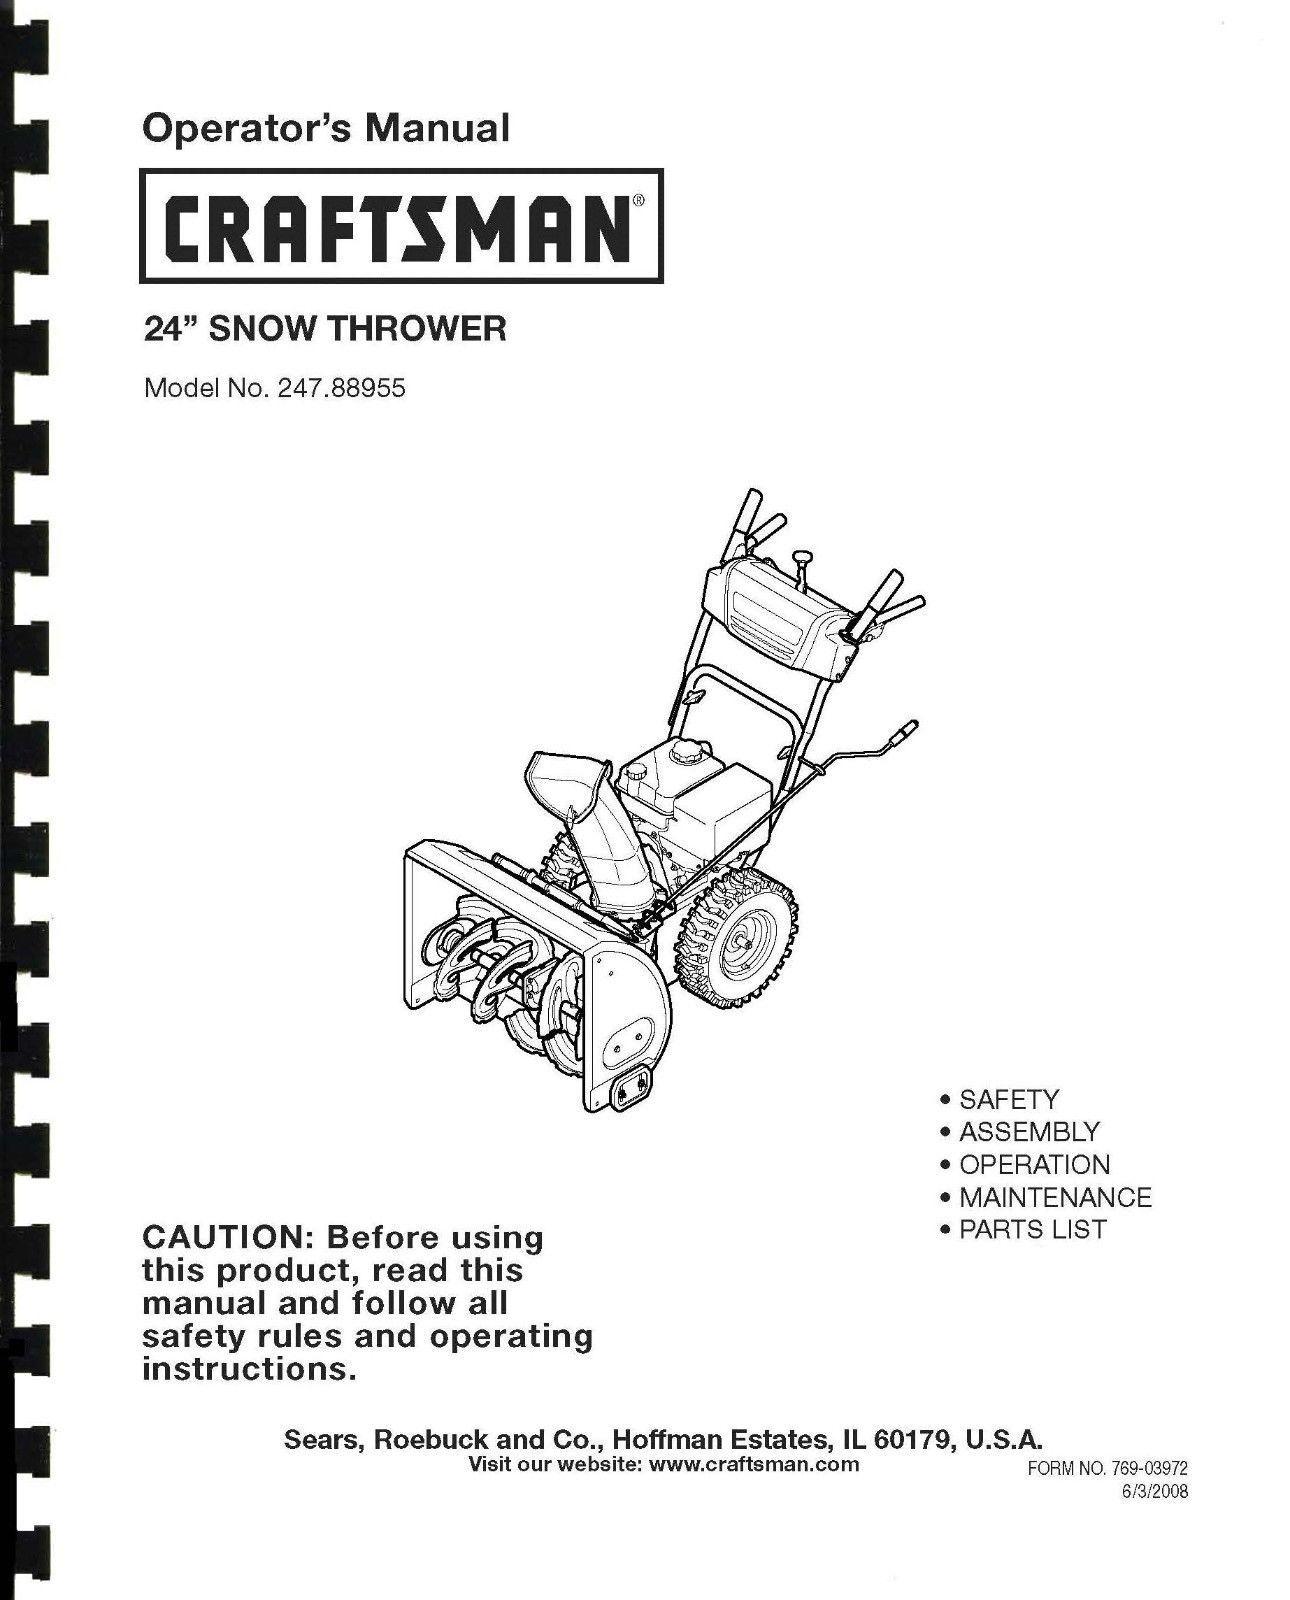 Craftsman Snow Thrower Operator/'s Manual Model No 247.885690